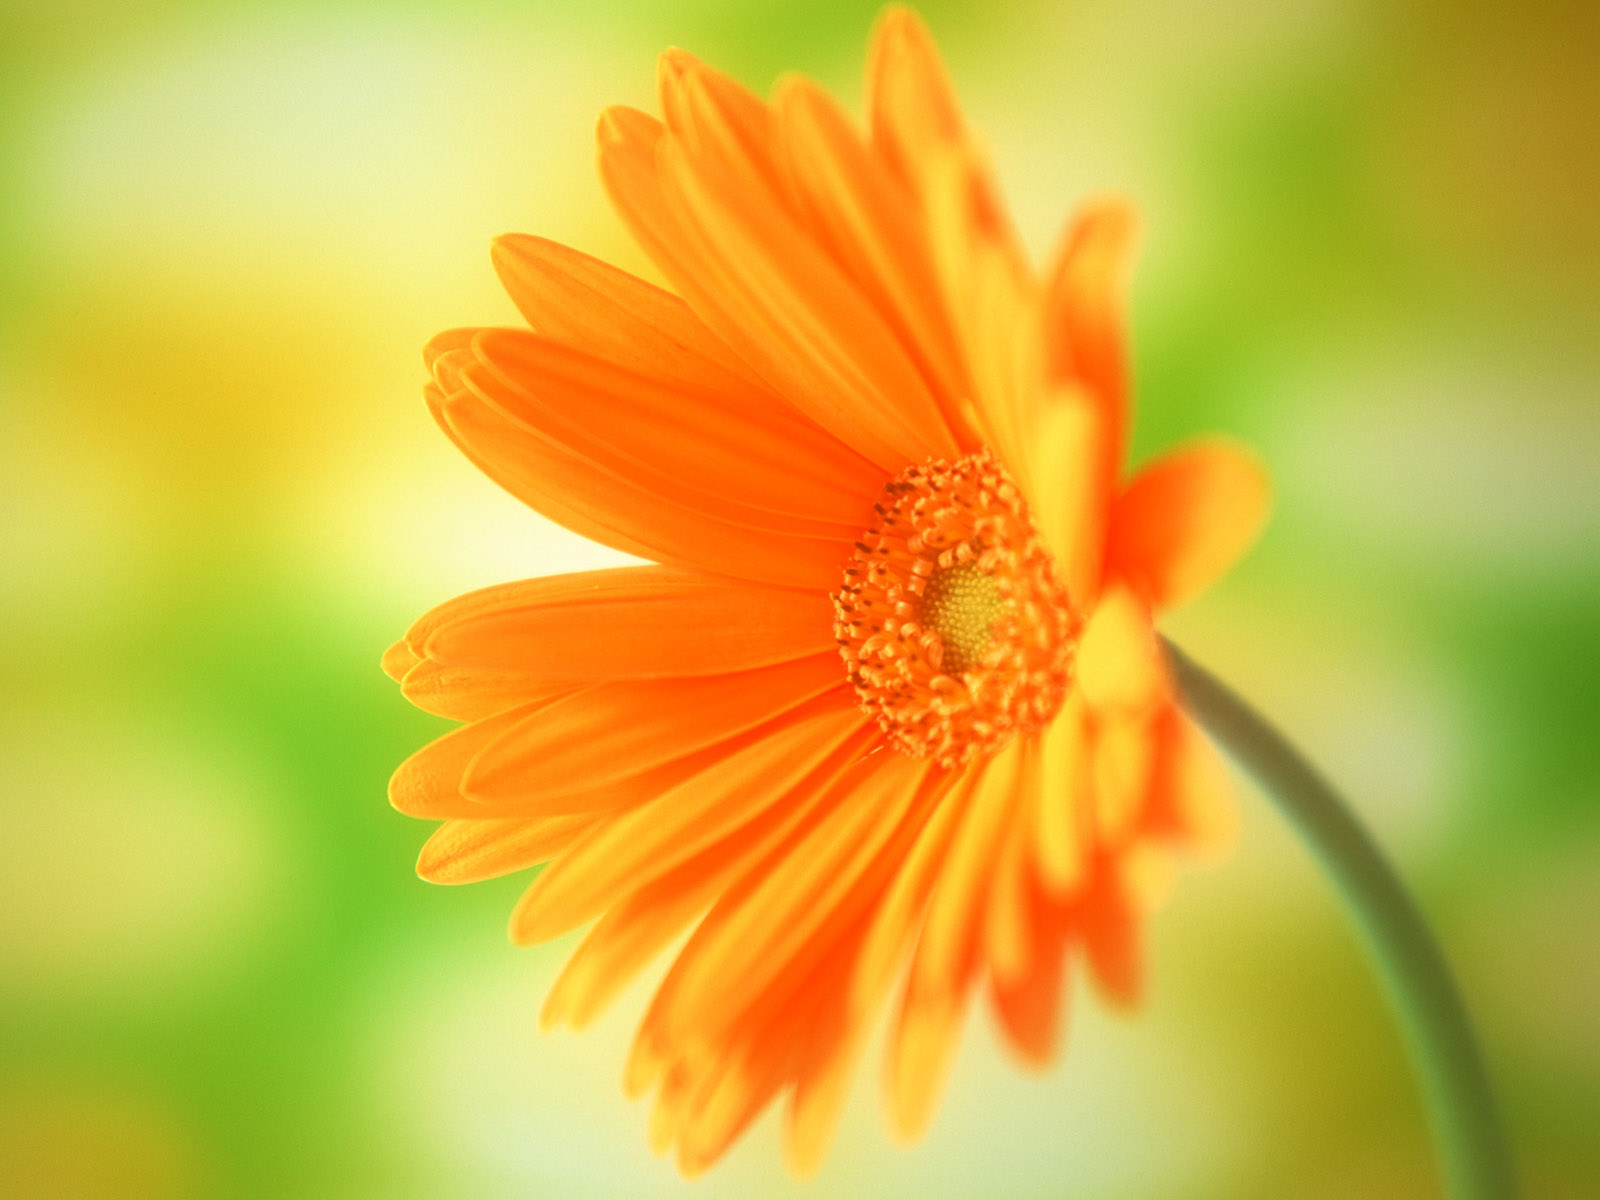 Flower image download image free stock Flower Wallpaper Download - QyGjxZ image free stock